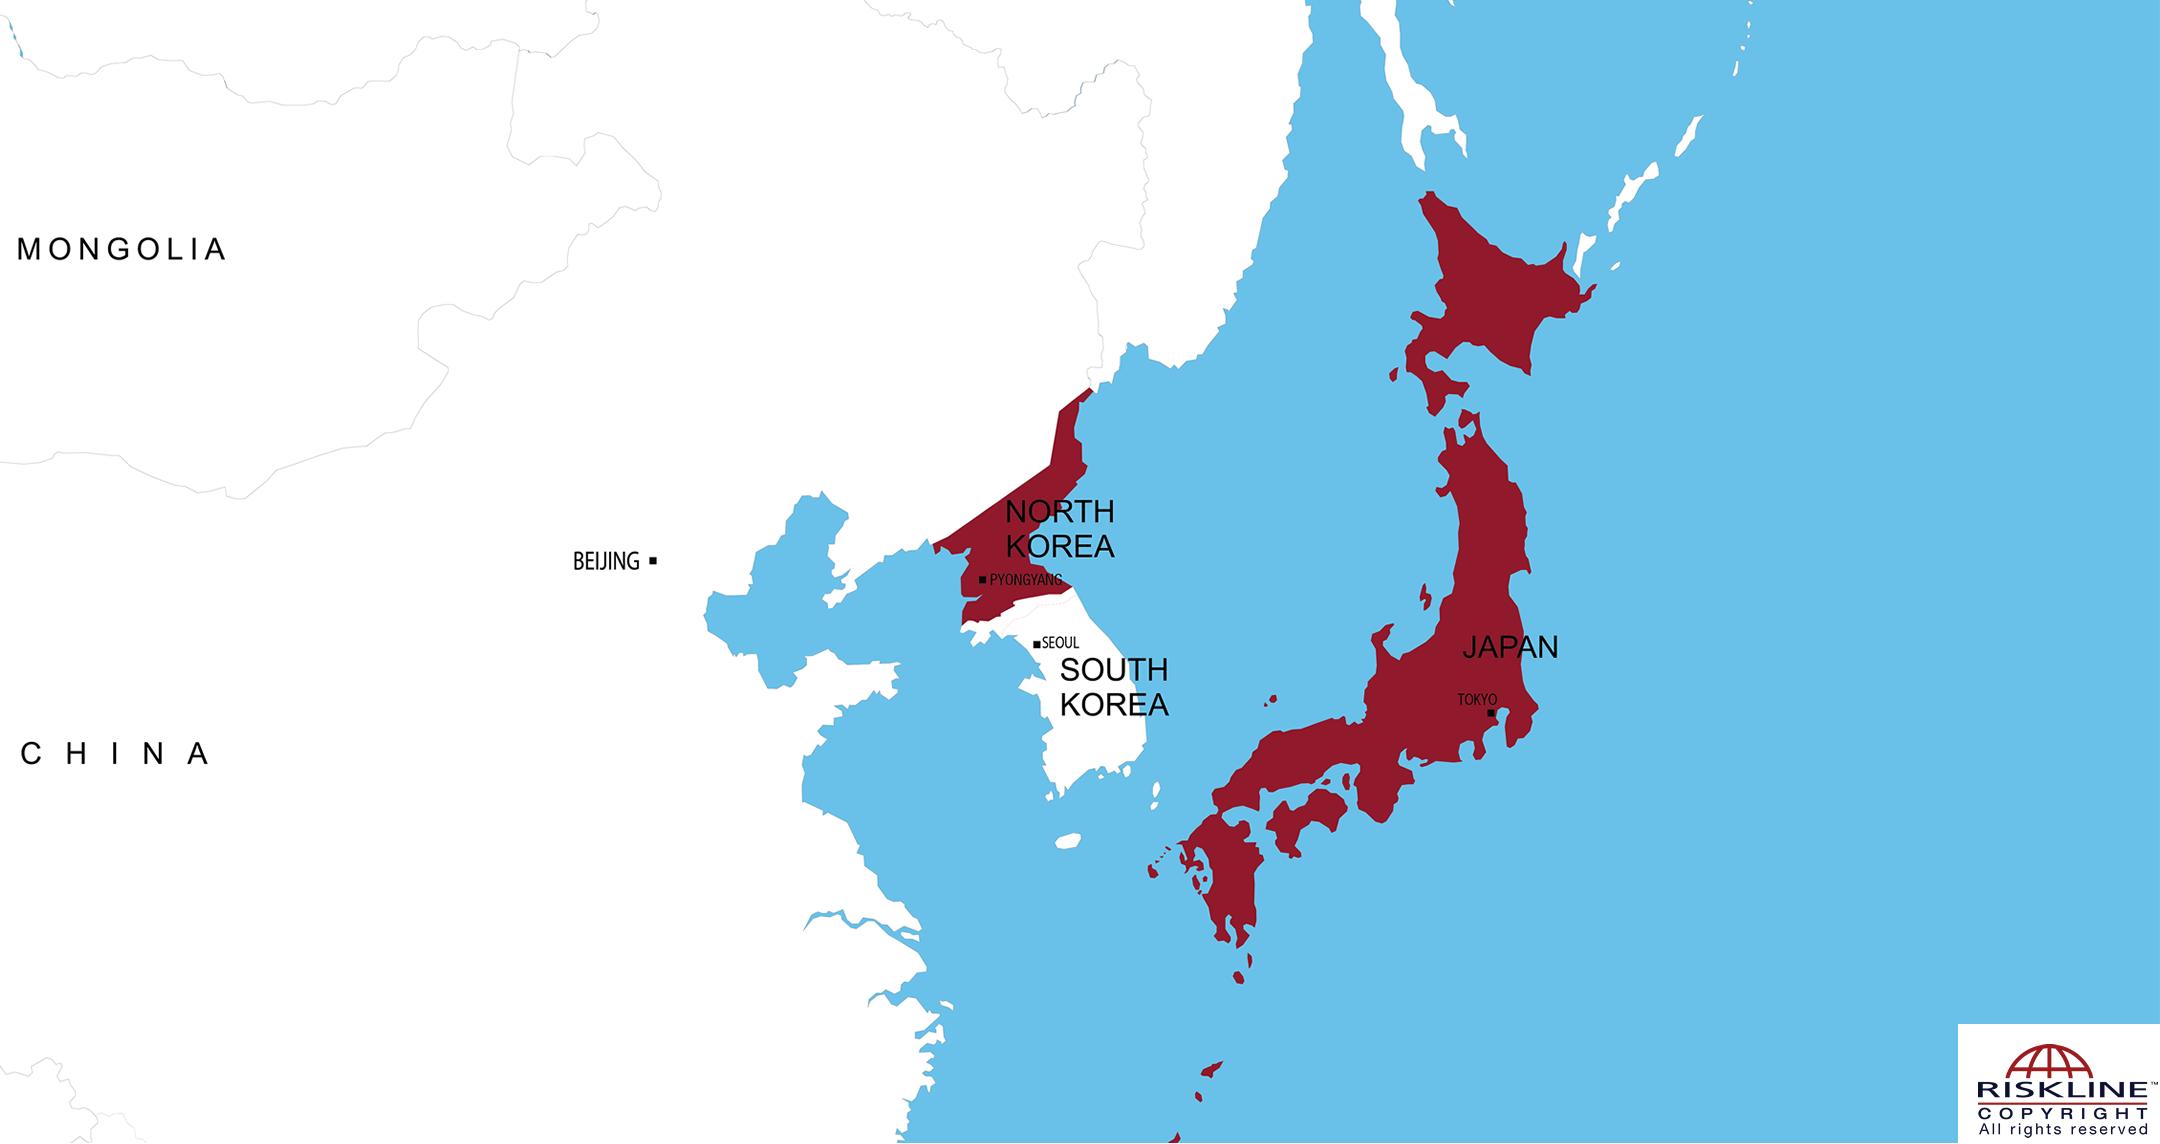 Map Of Asia Korean Peninsula.Riskline Travel Risk Information